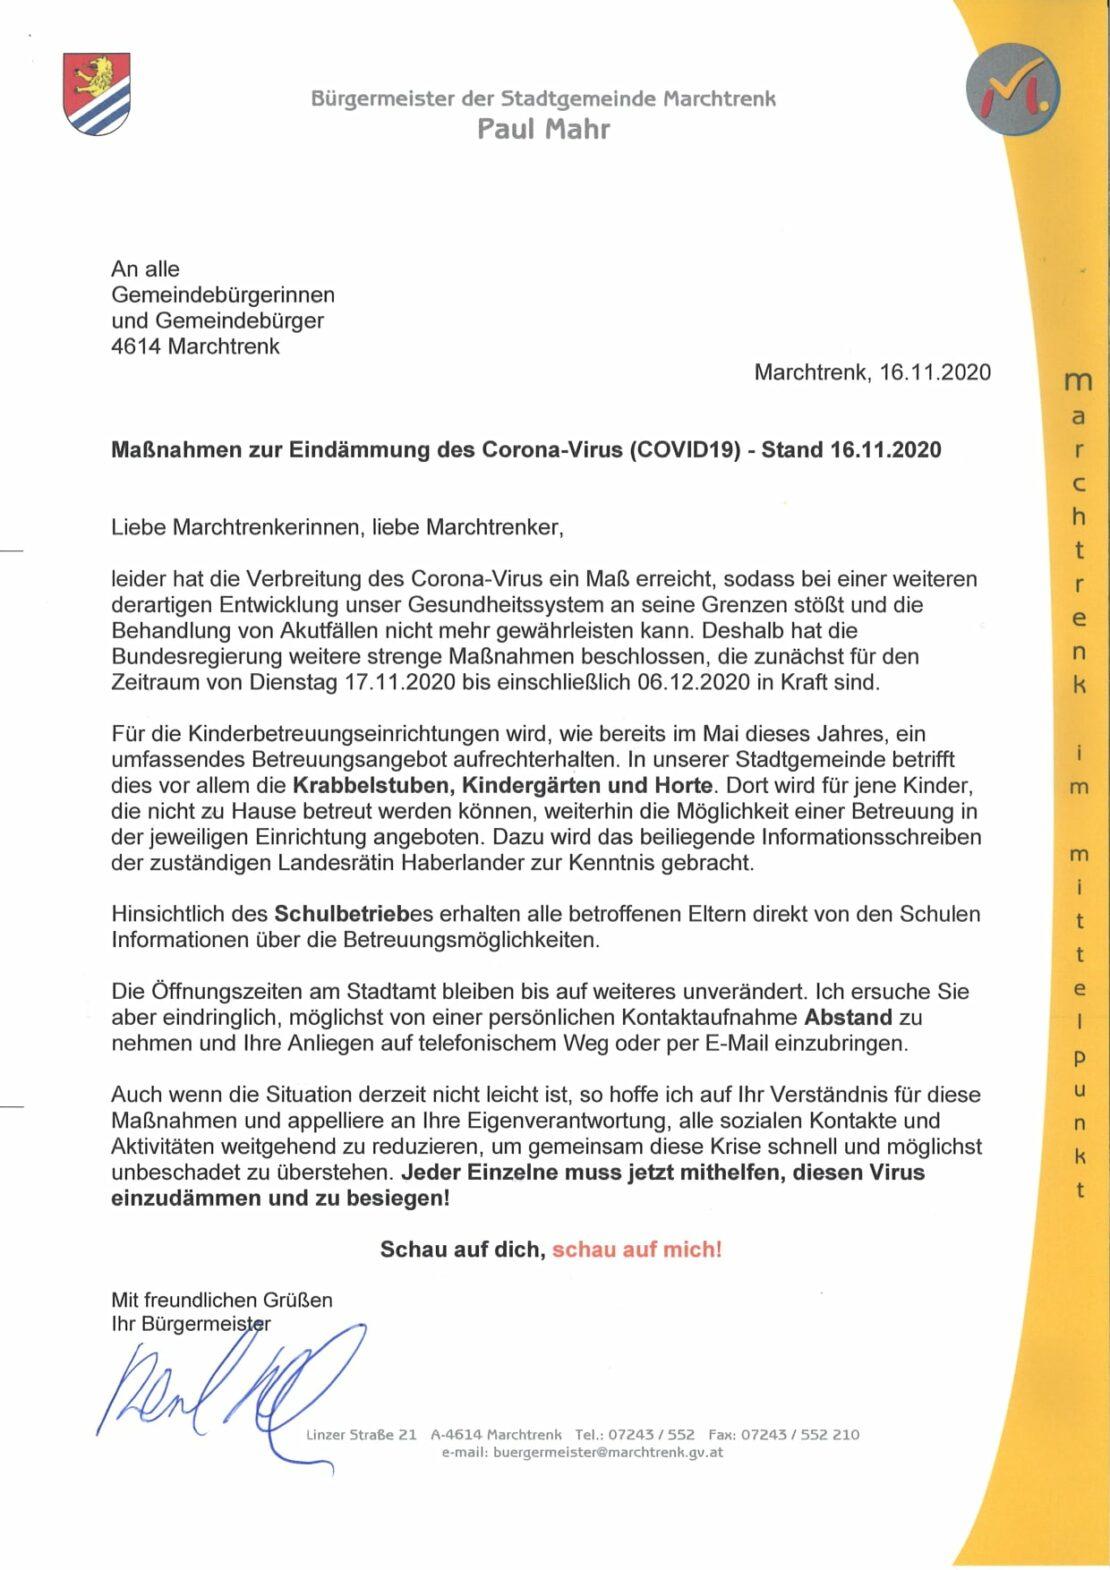 Paul Mahr äußert sich zu Corona